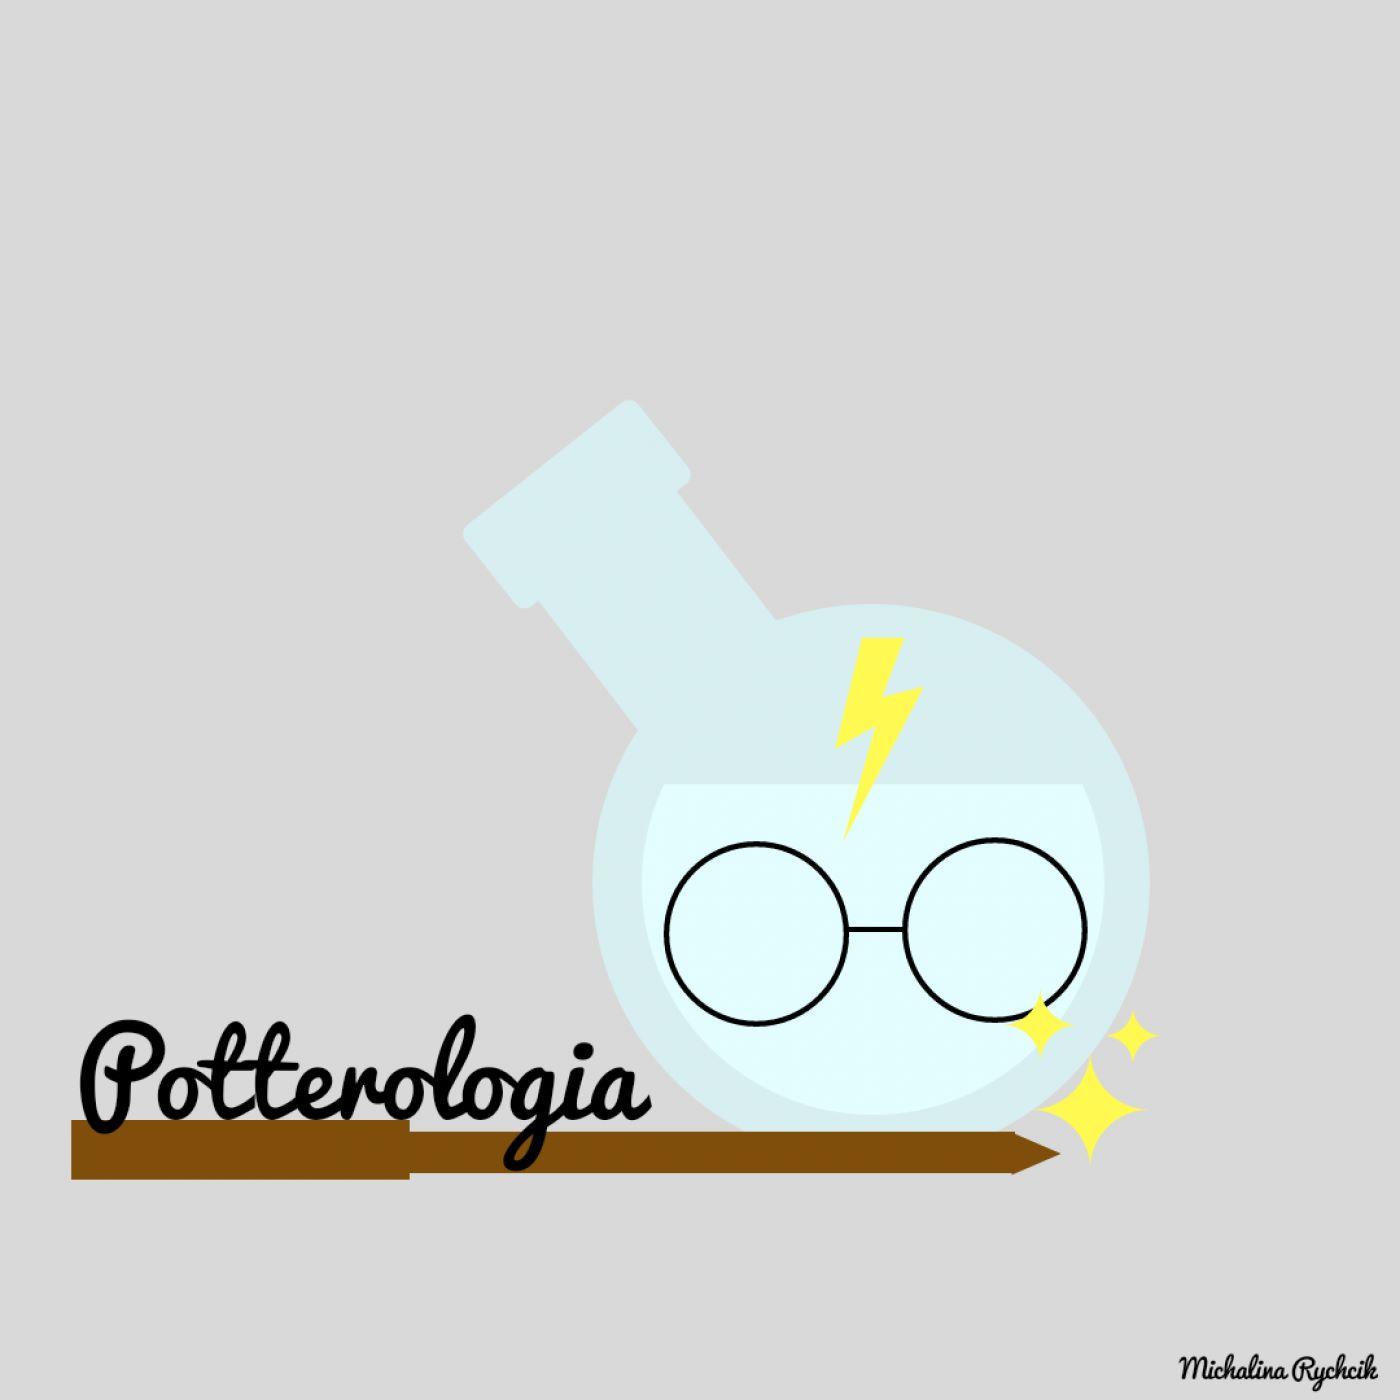 Potterologia